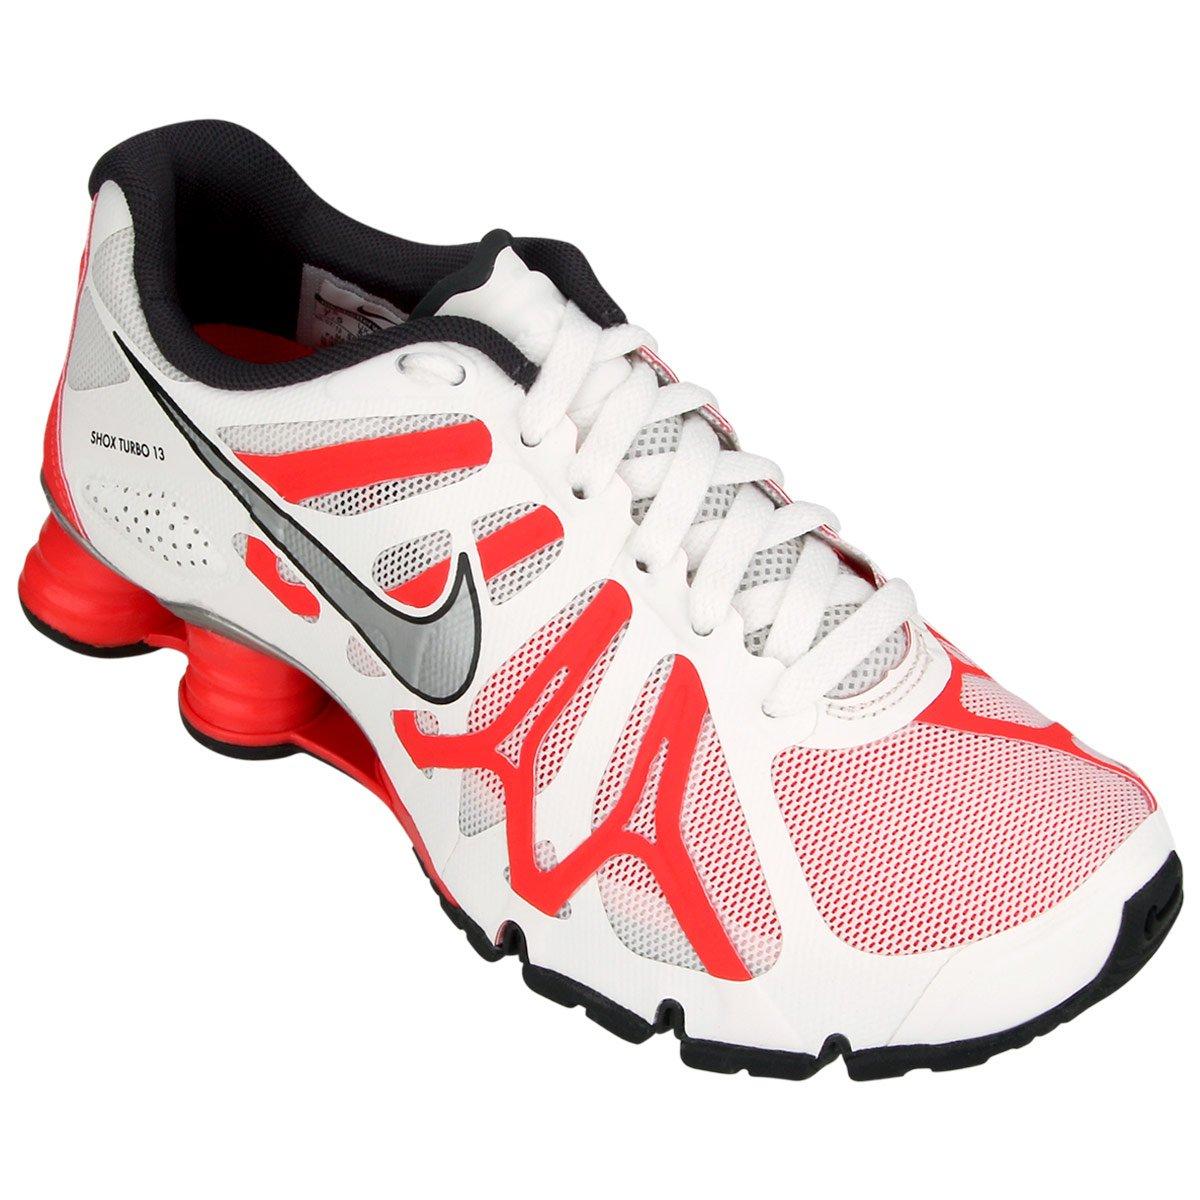 28d61ffdc893 spain new year deals women nike shox turbo 13 running shoe sku100150 219  e80b0 37230  real tênis nike shox turbo 13 feminino brancovermelho 1ceca  9f049